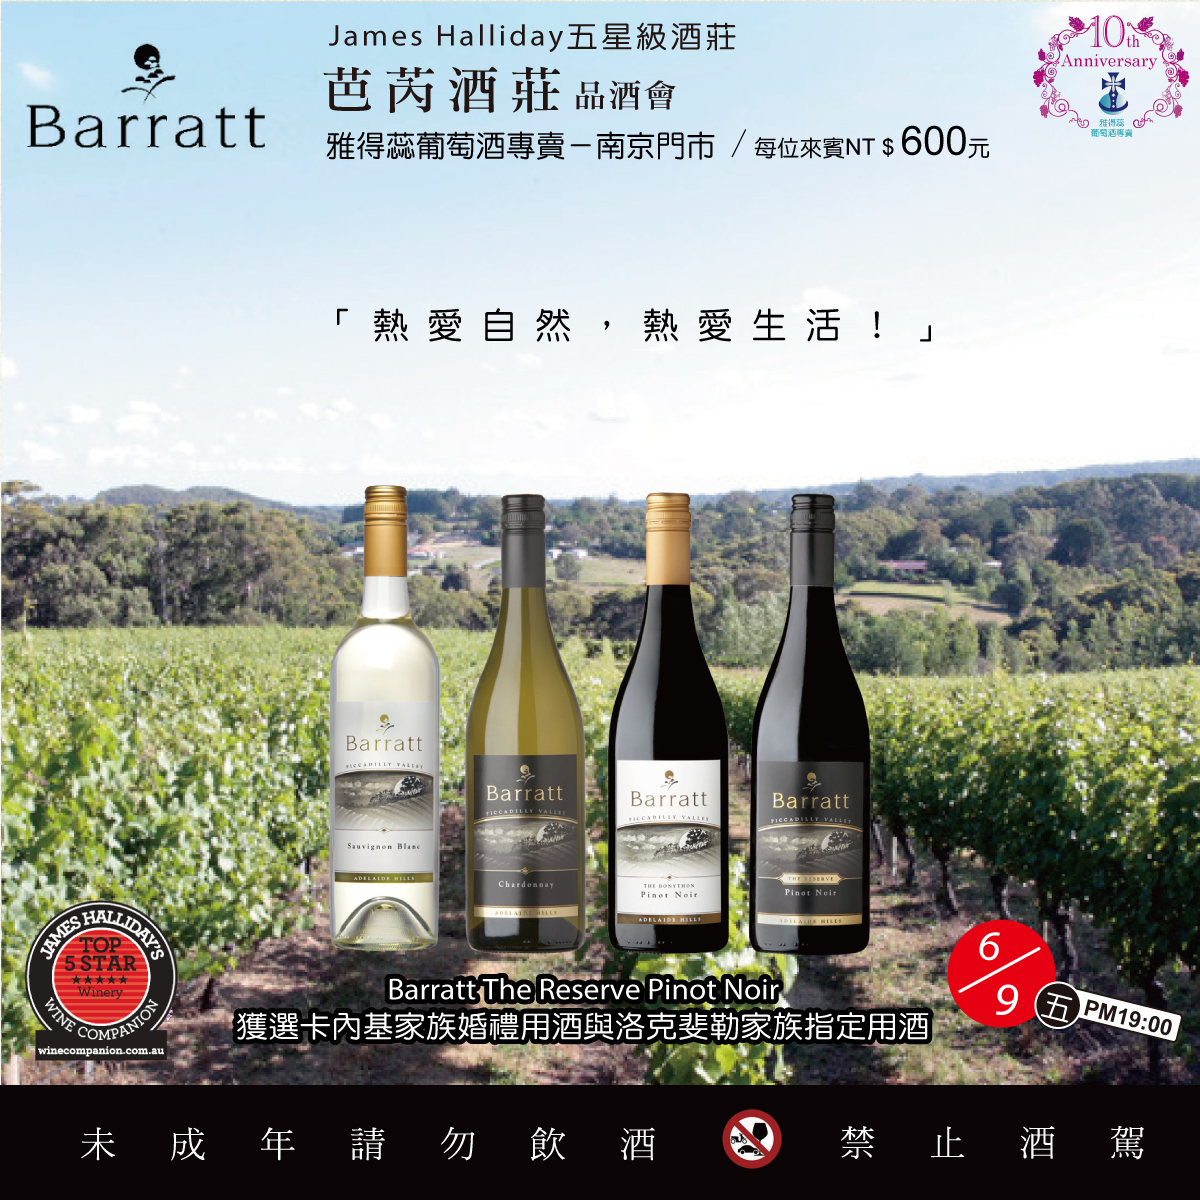 20170609-FB廣告_Barratt-酒_proof.jpg